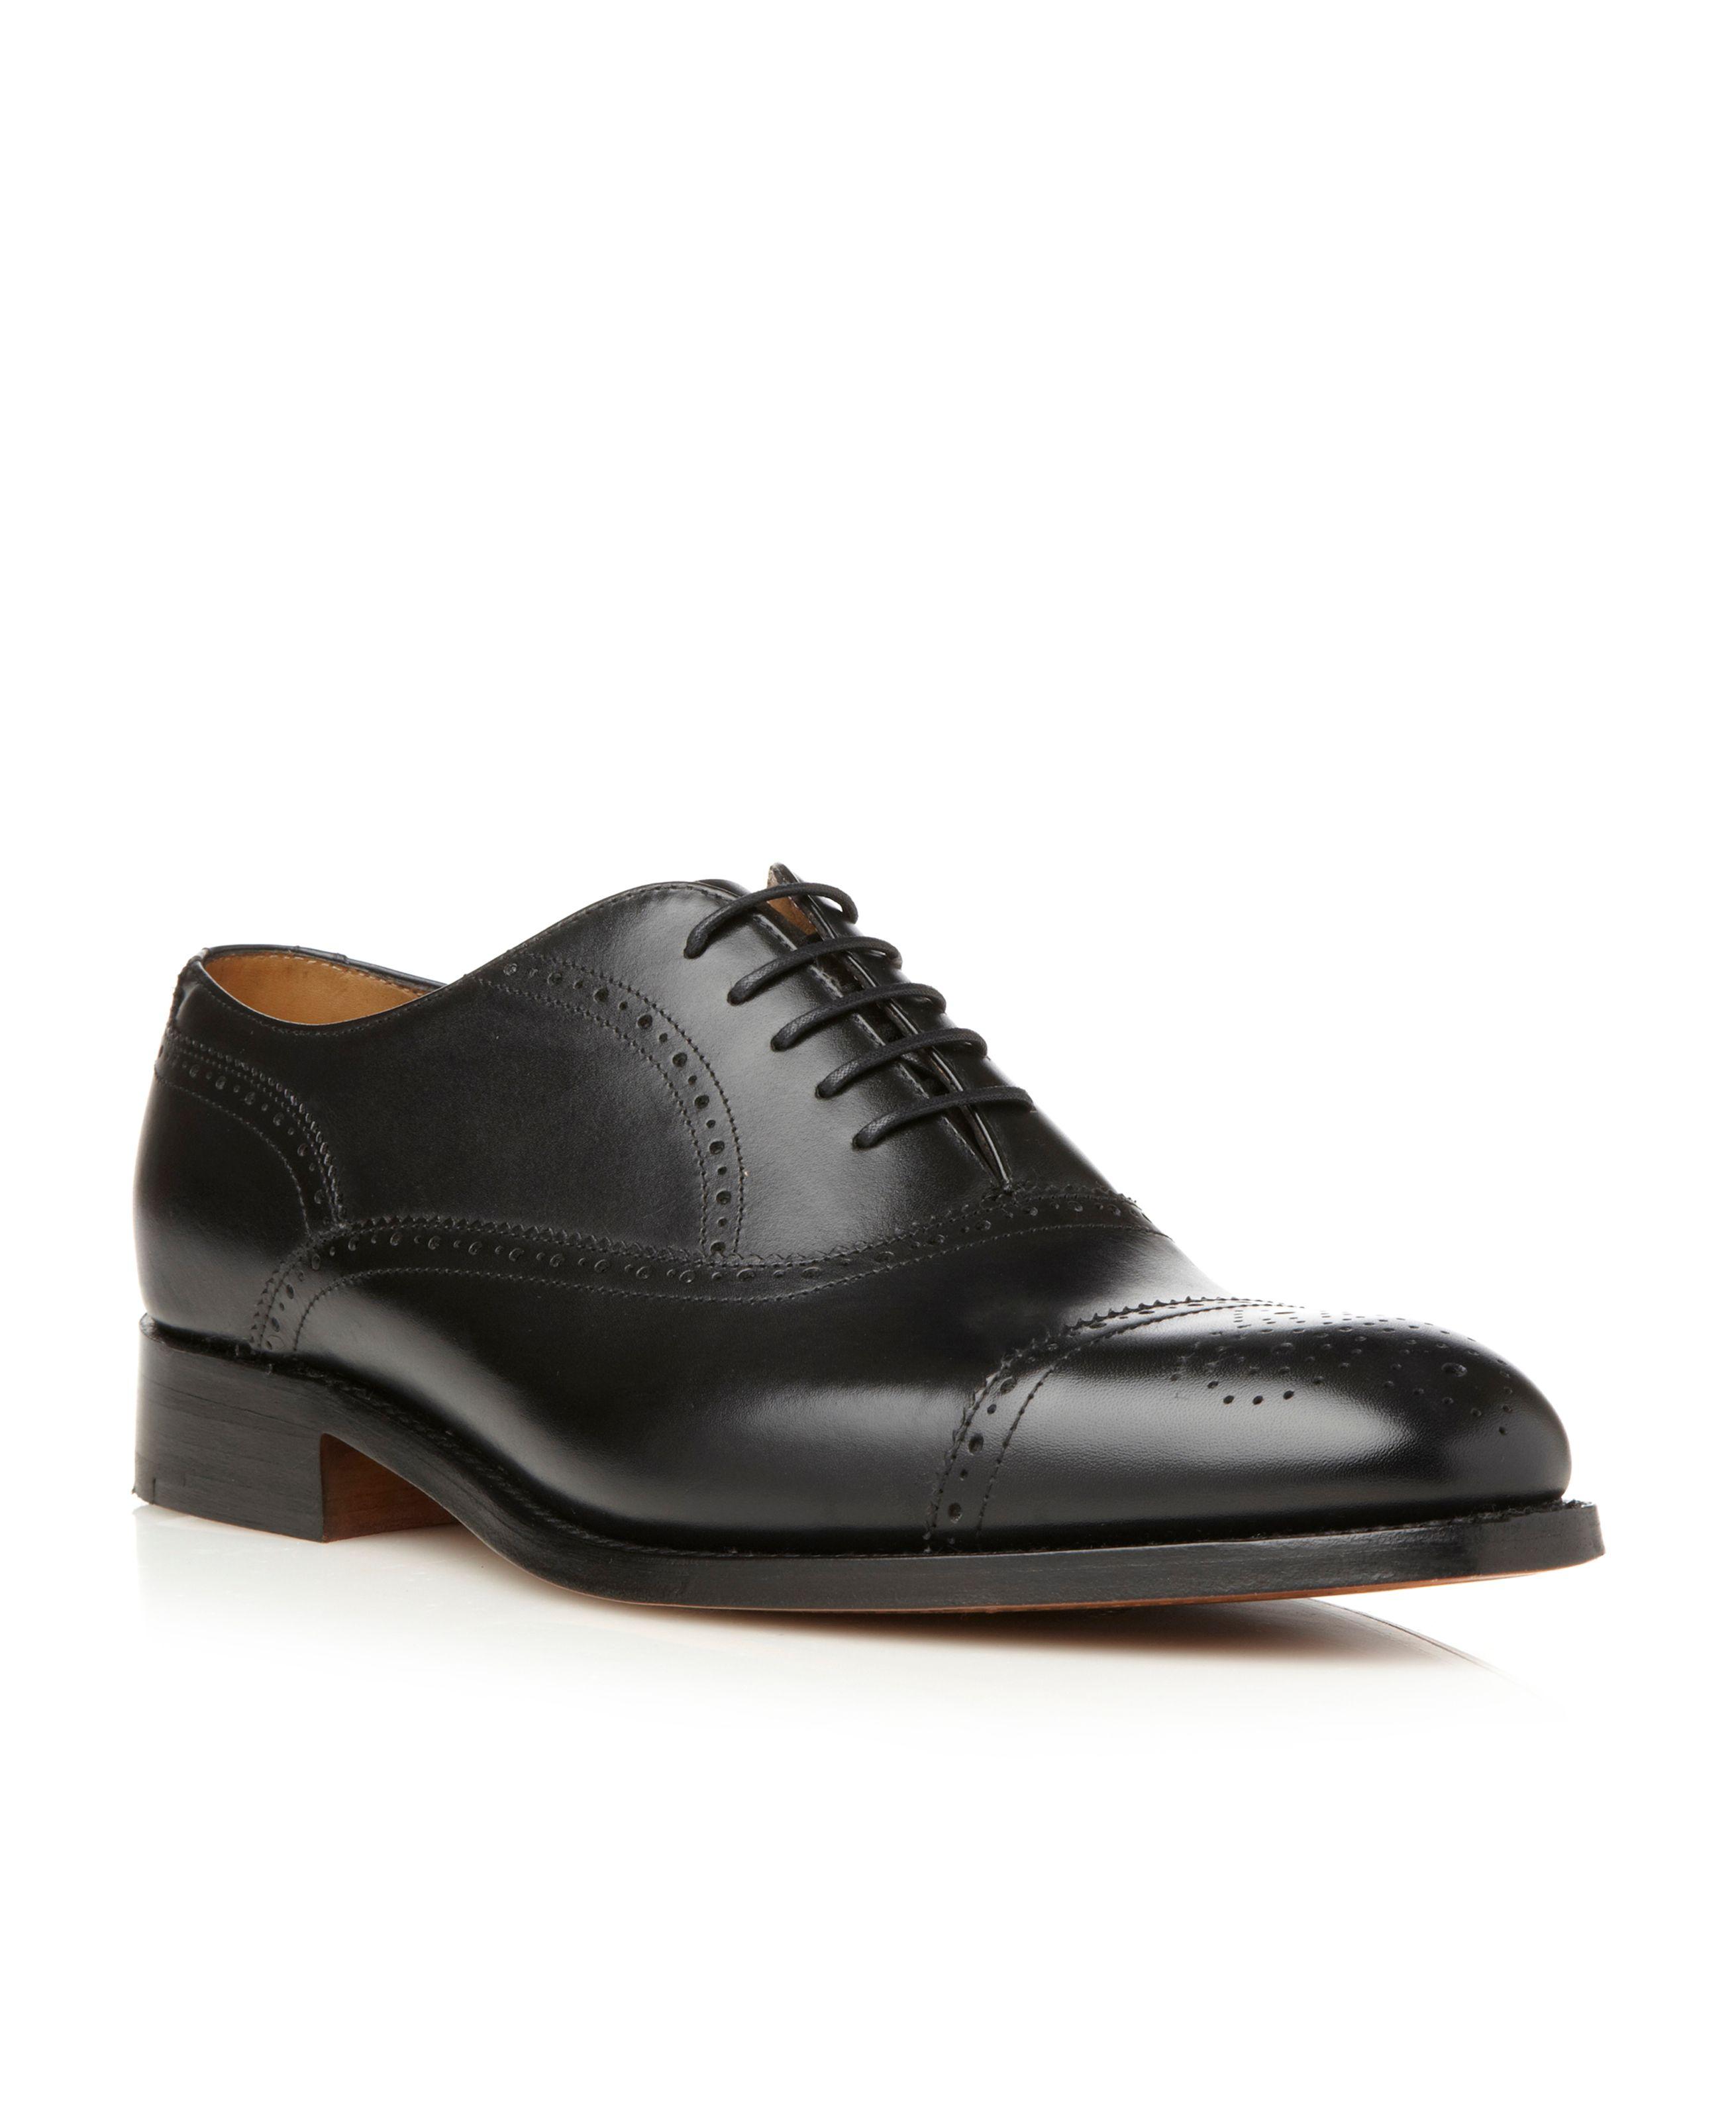 Cheap Uk Barker Shoes